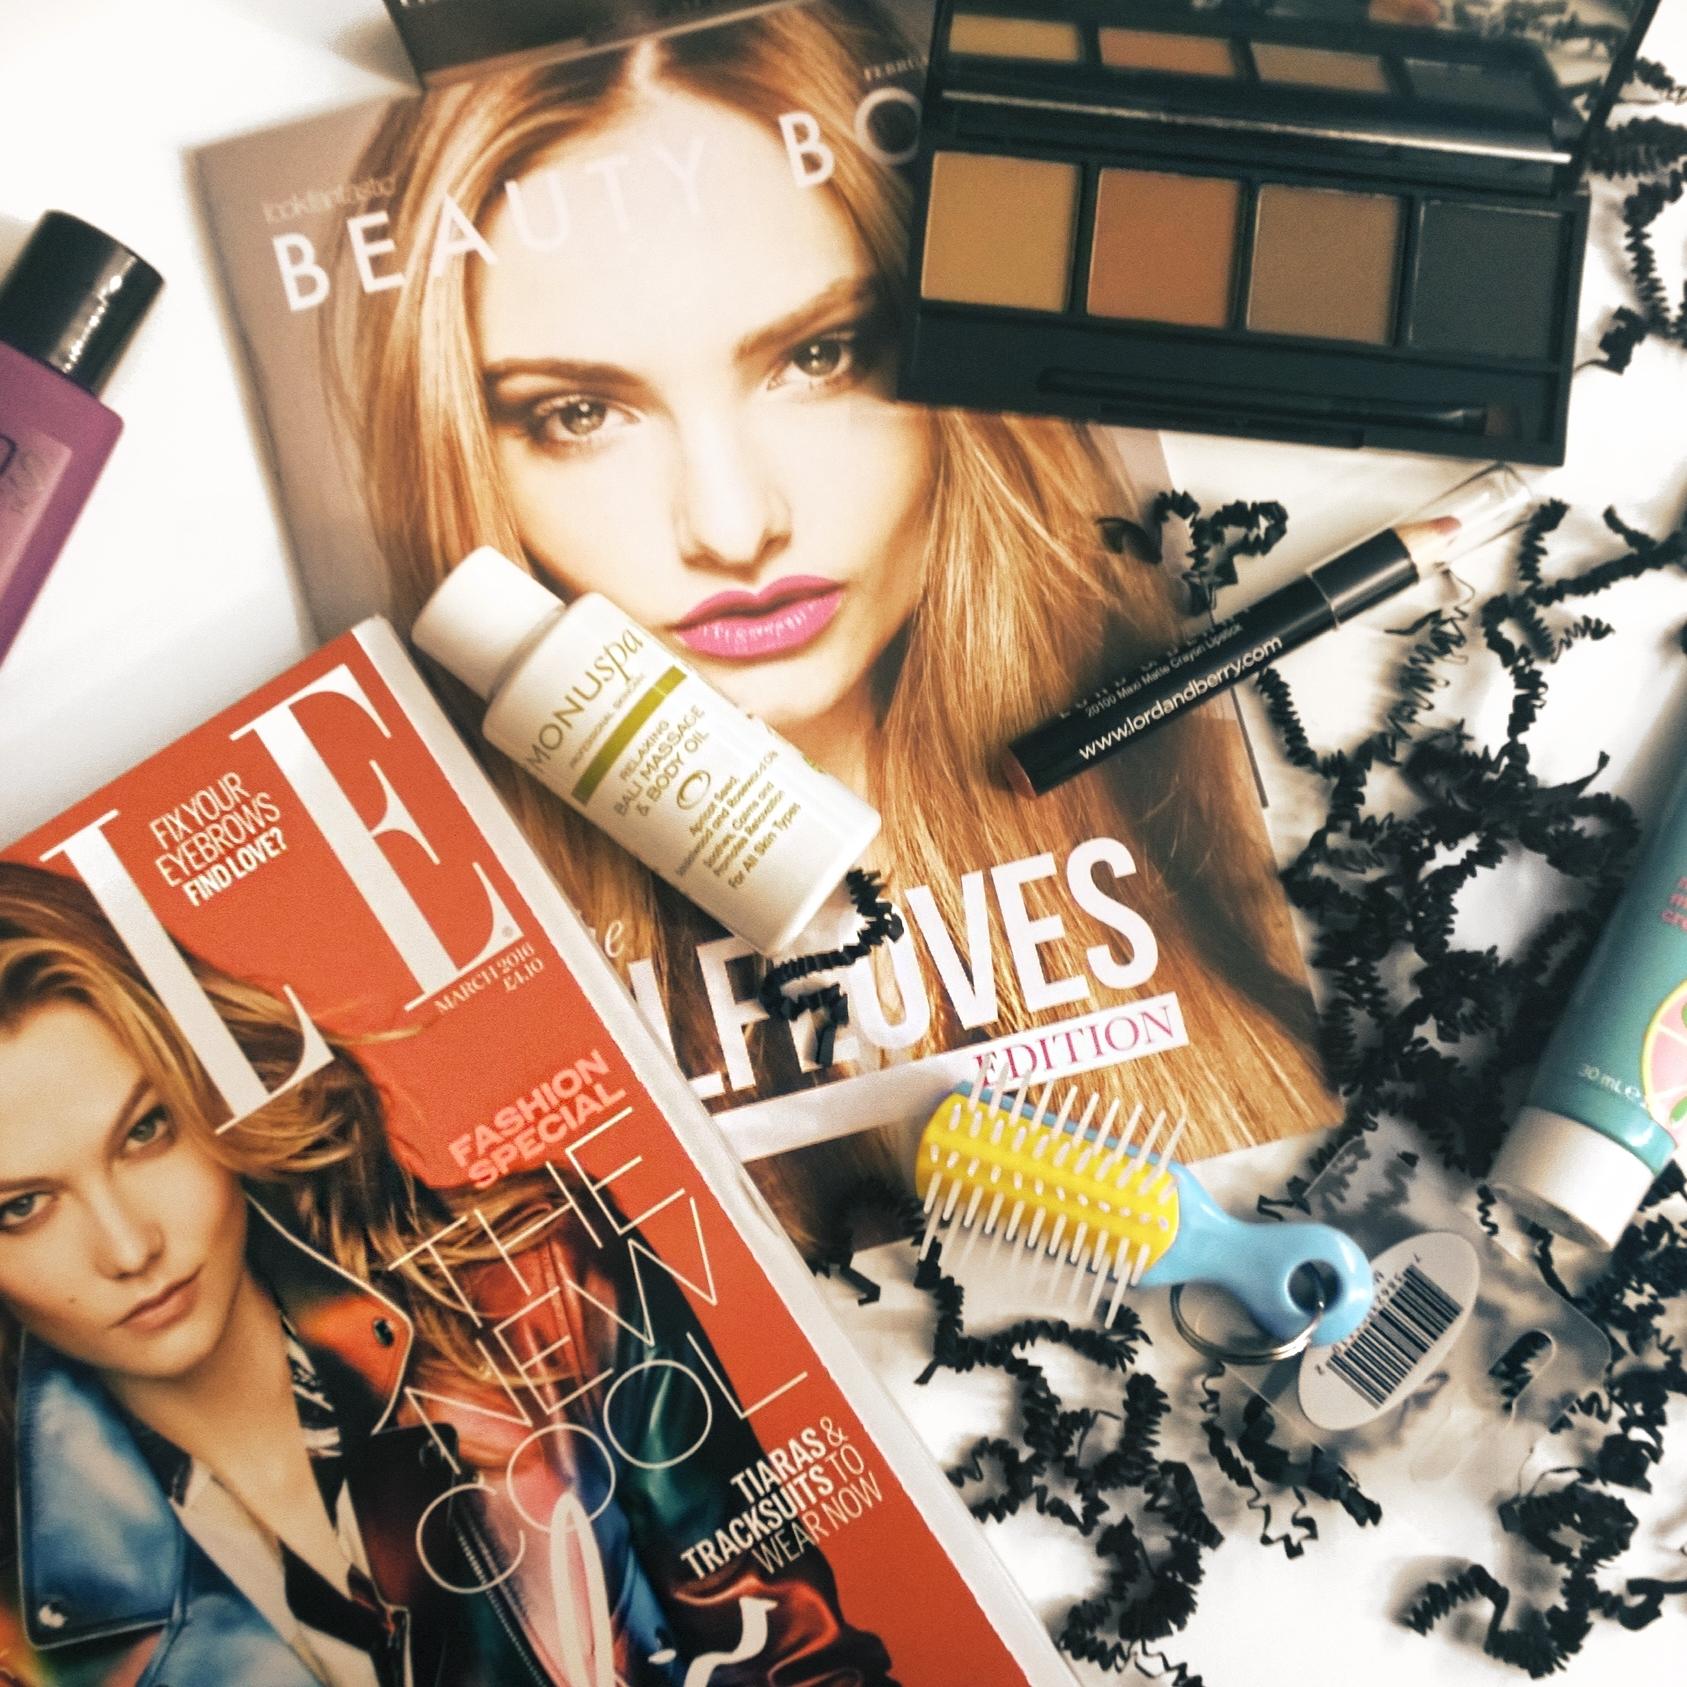 Lookfantastic Beauty Box Februar 2016 Inhalt #lfloves